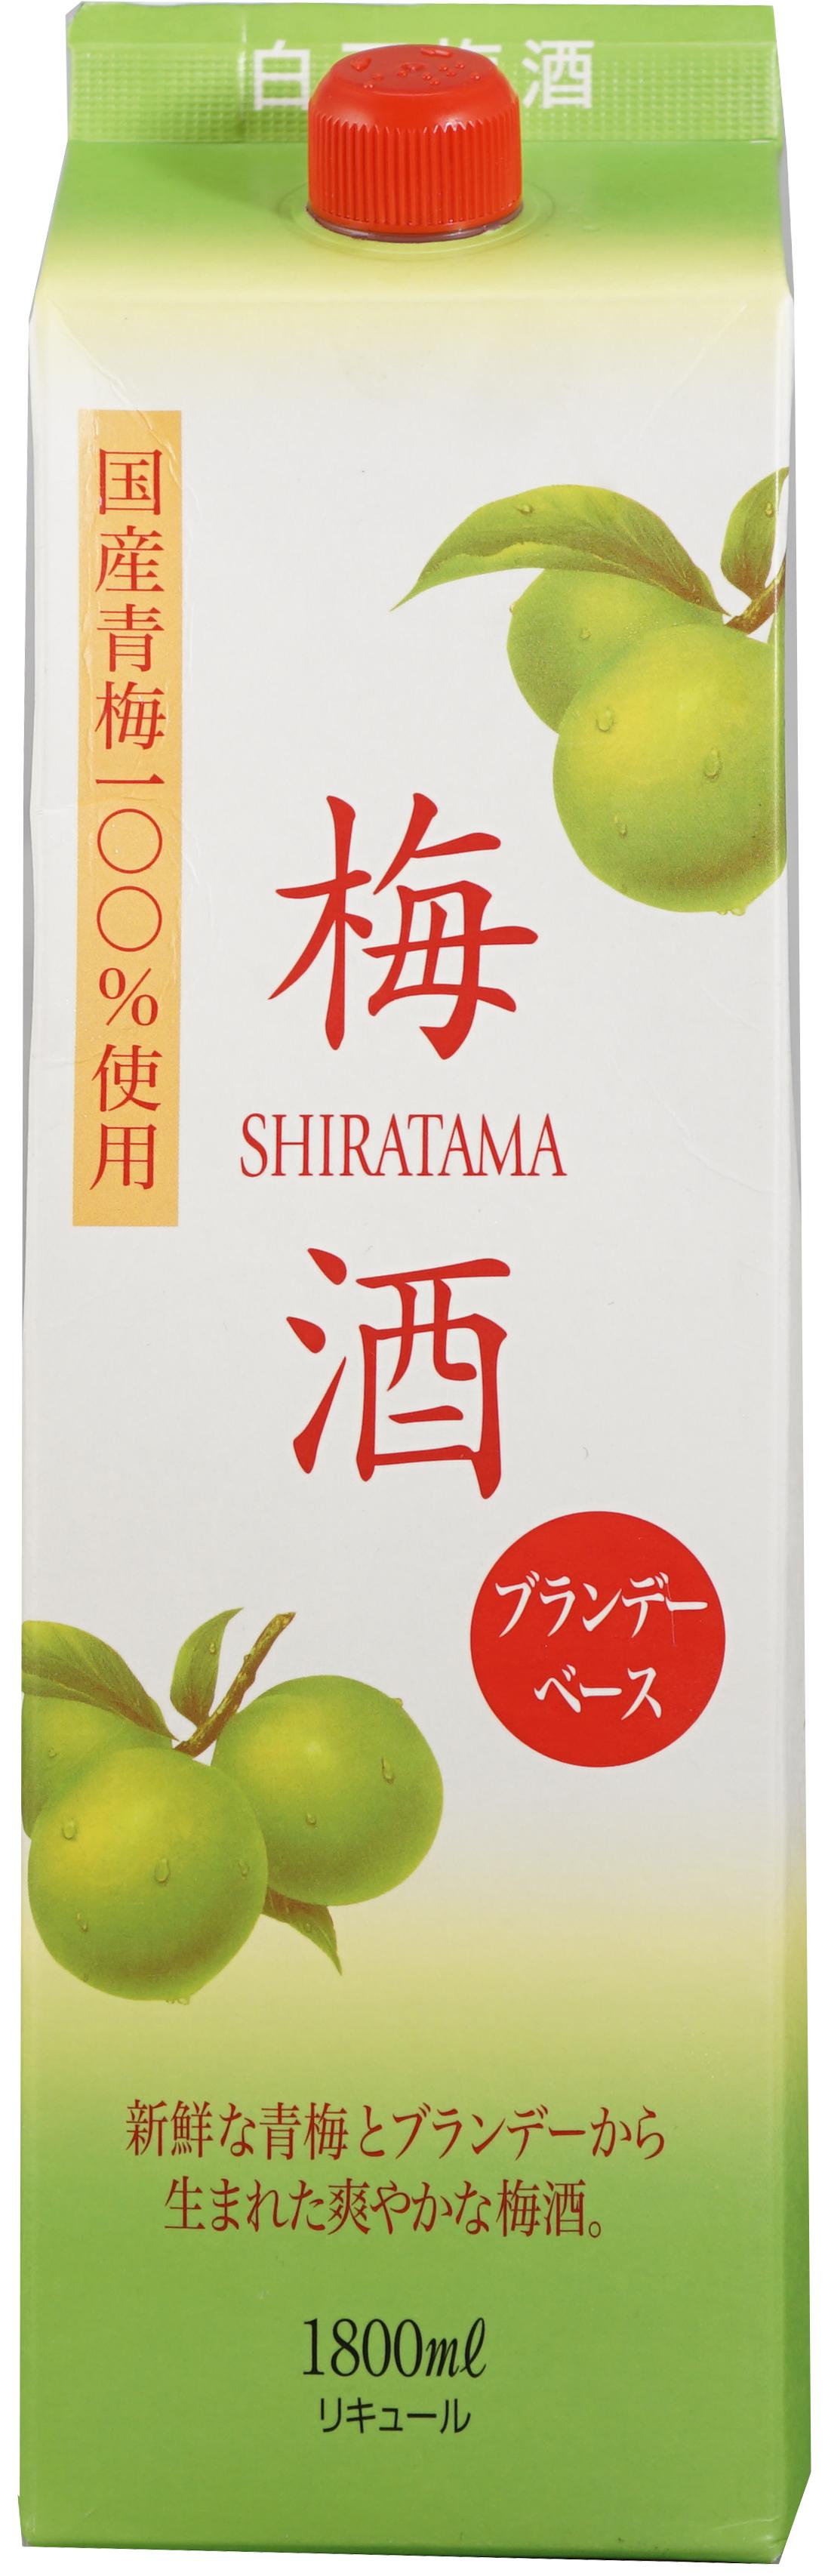 Shiratama Plum Wine with Brandy